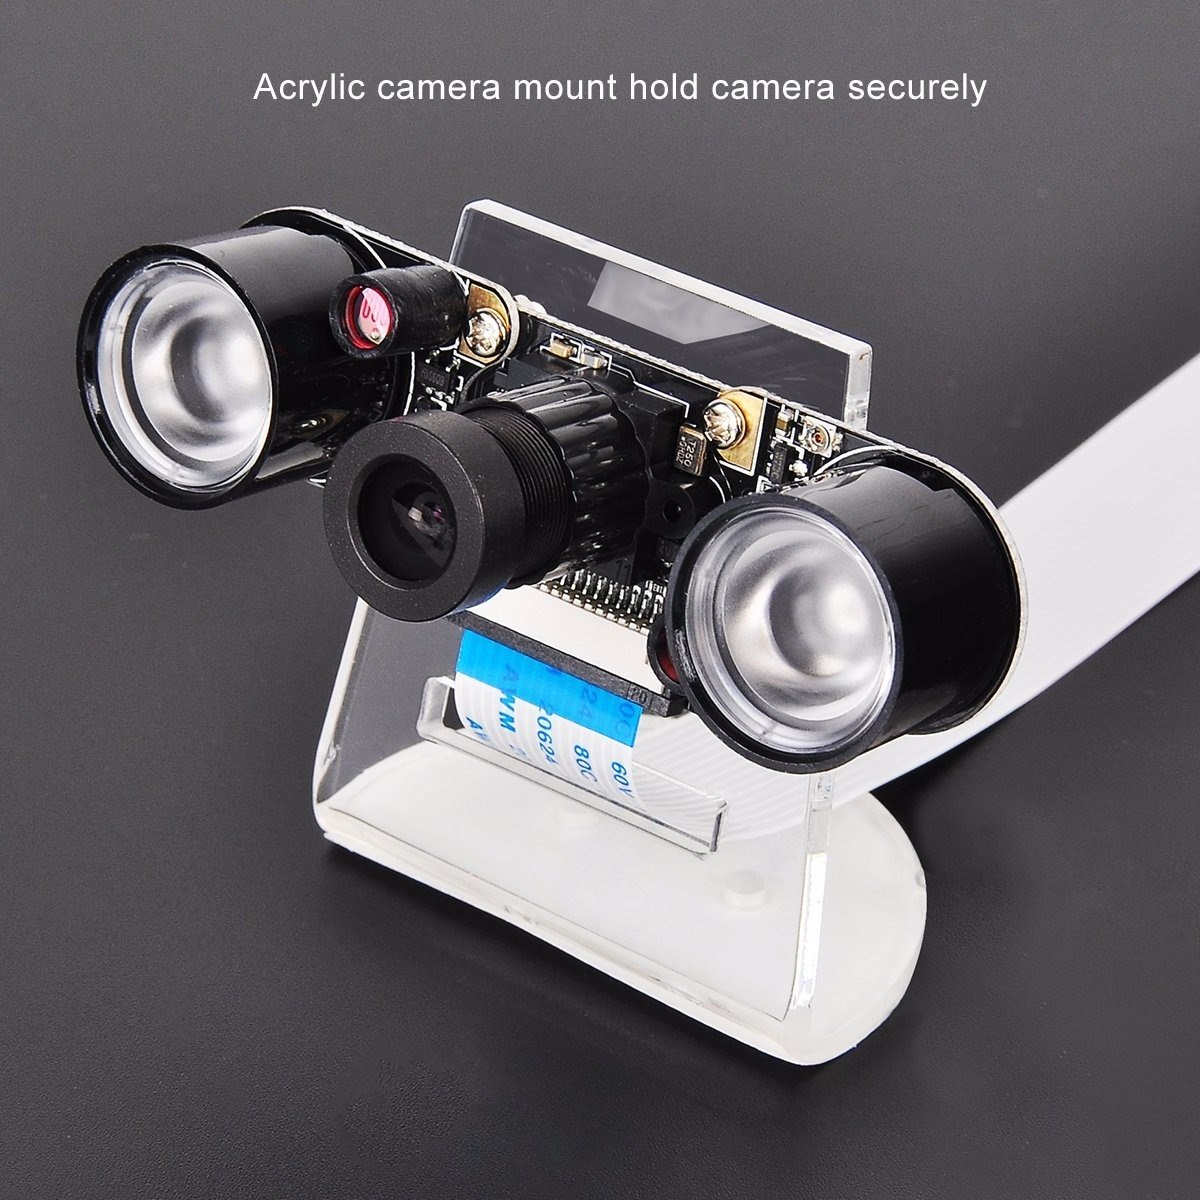 PiCamera on tinker board